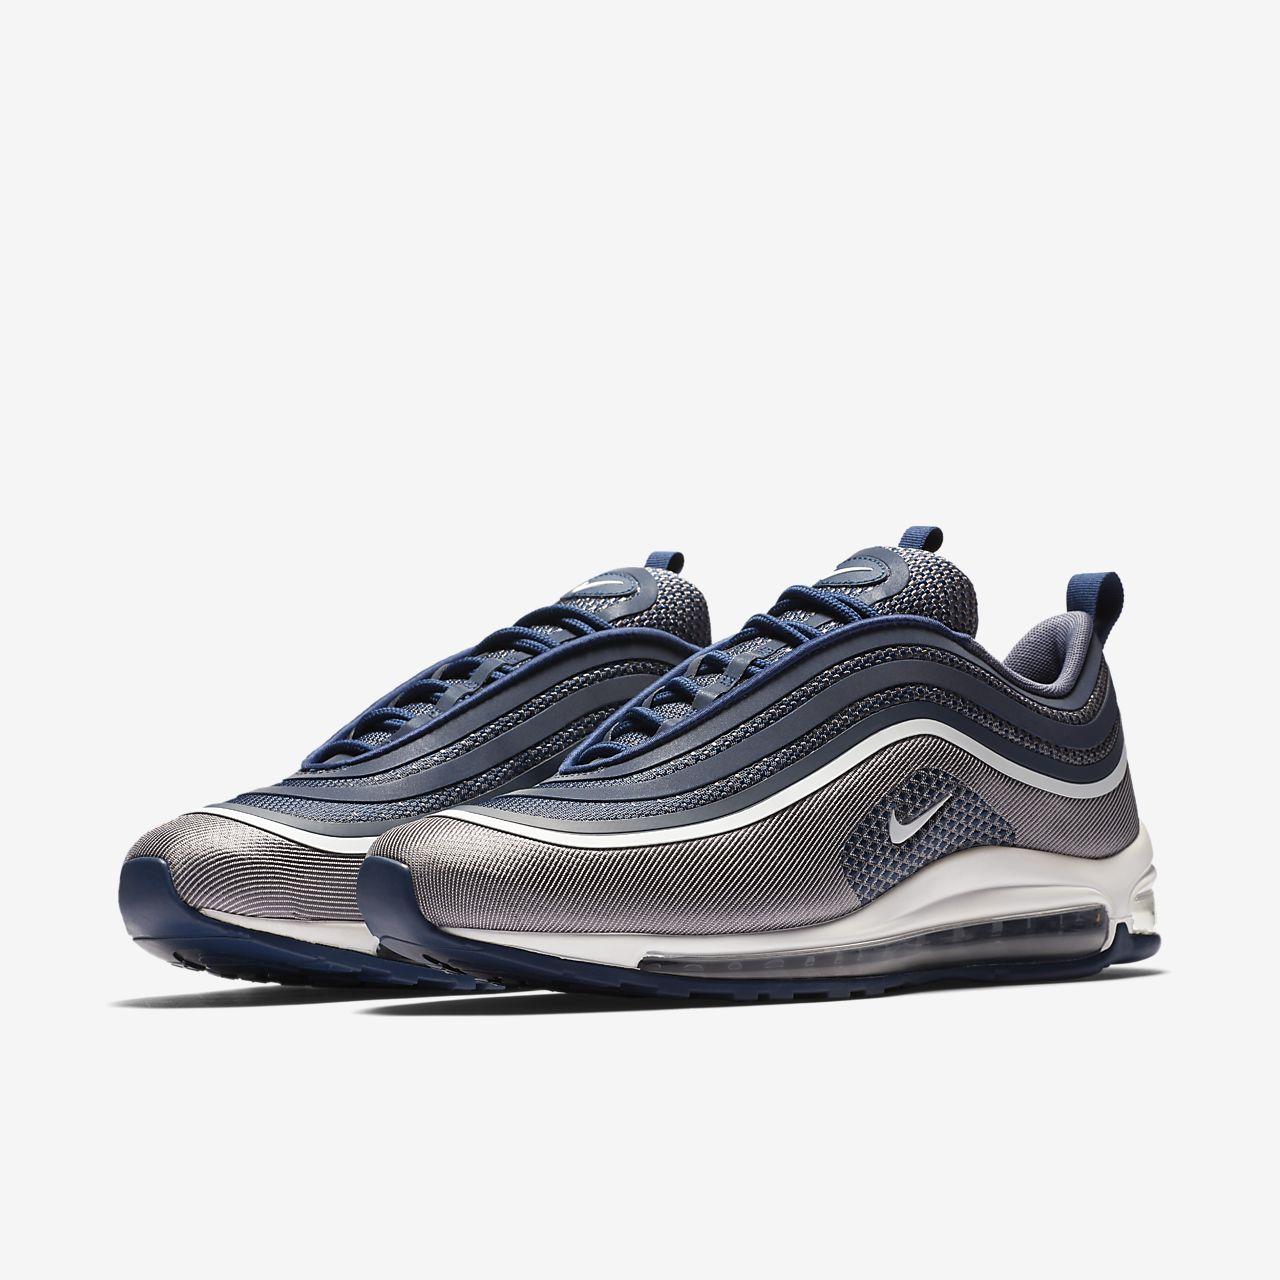 scarpe uomo nike air max 97 ultra